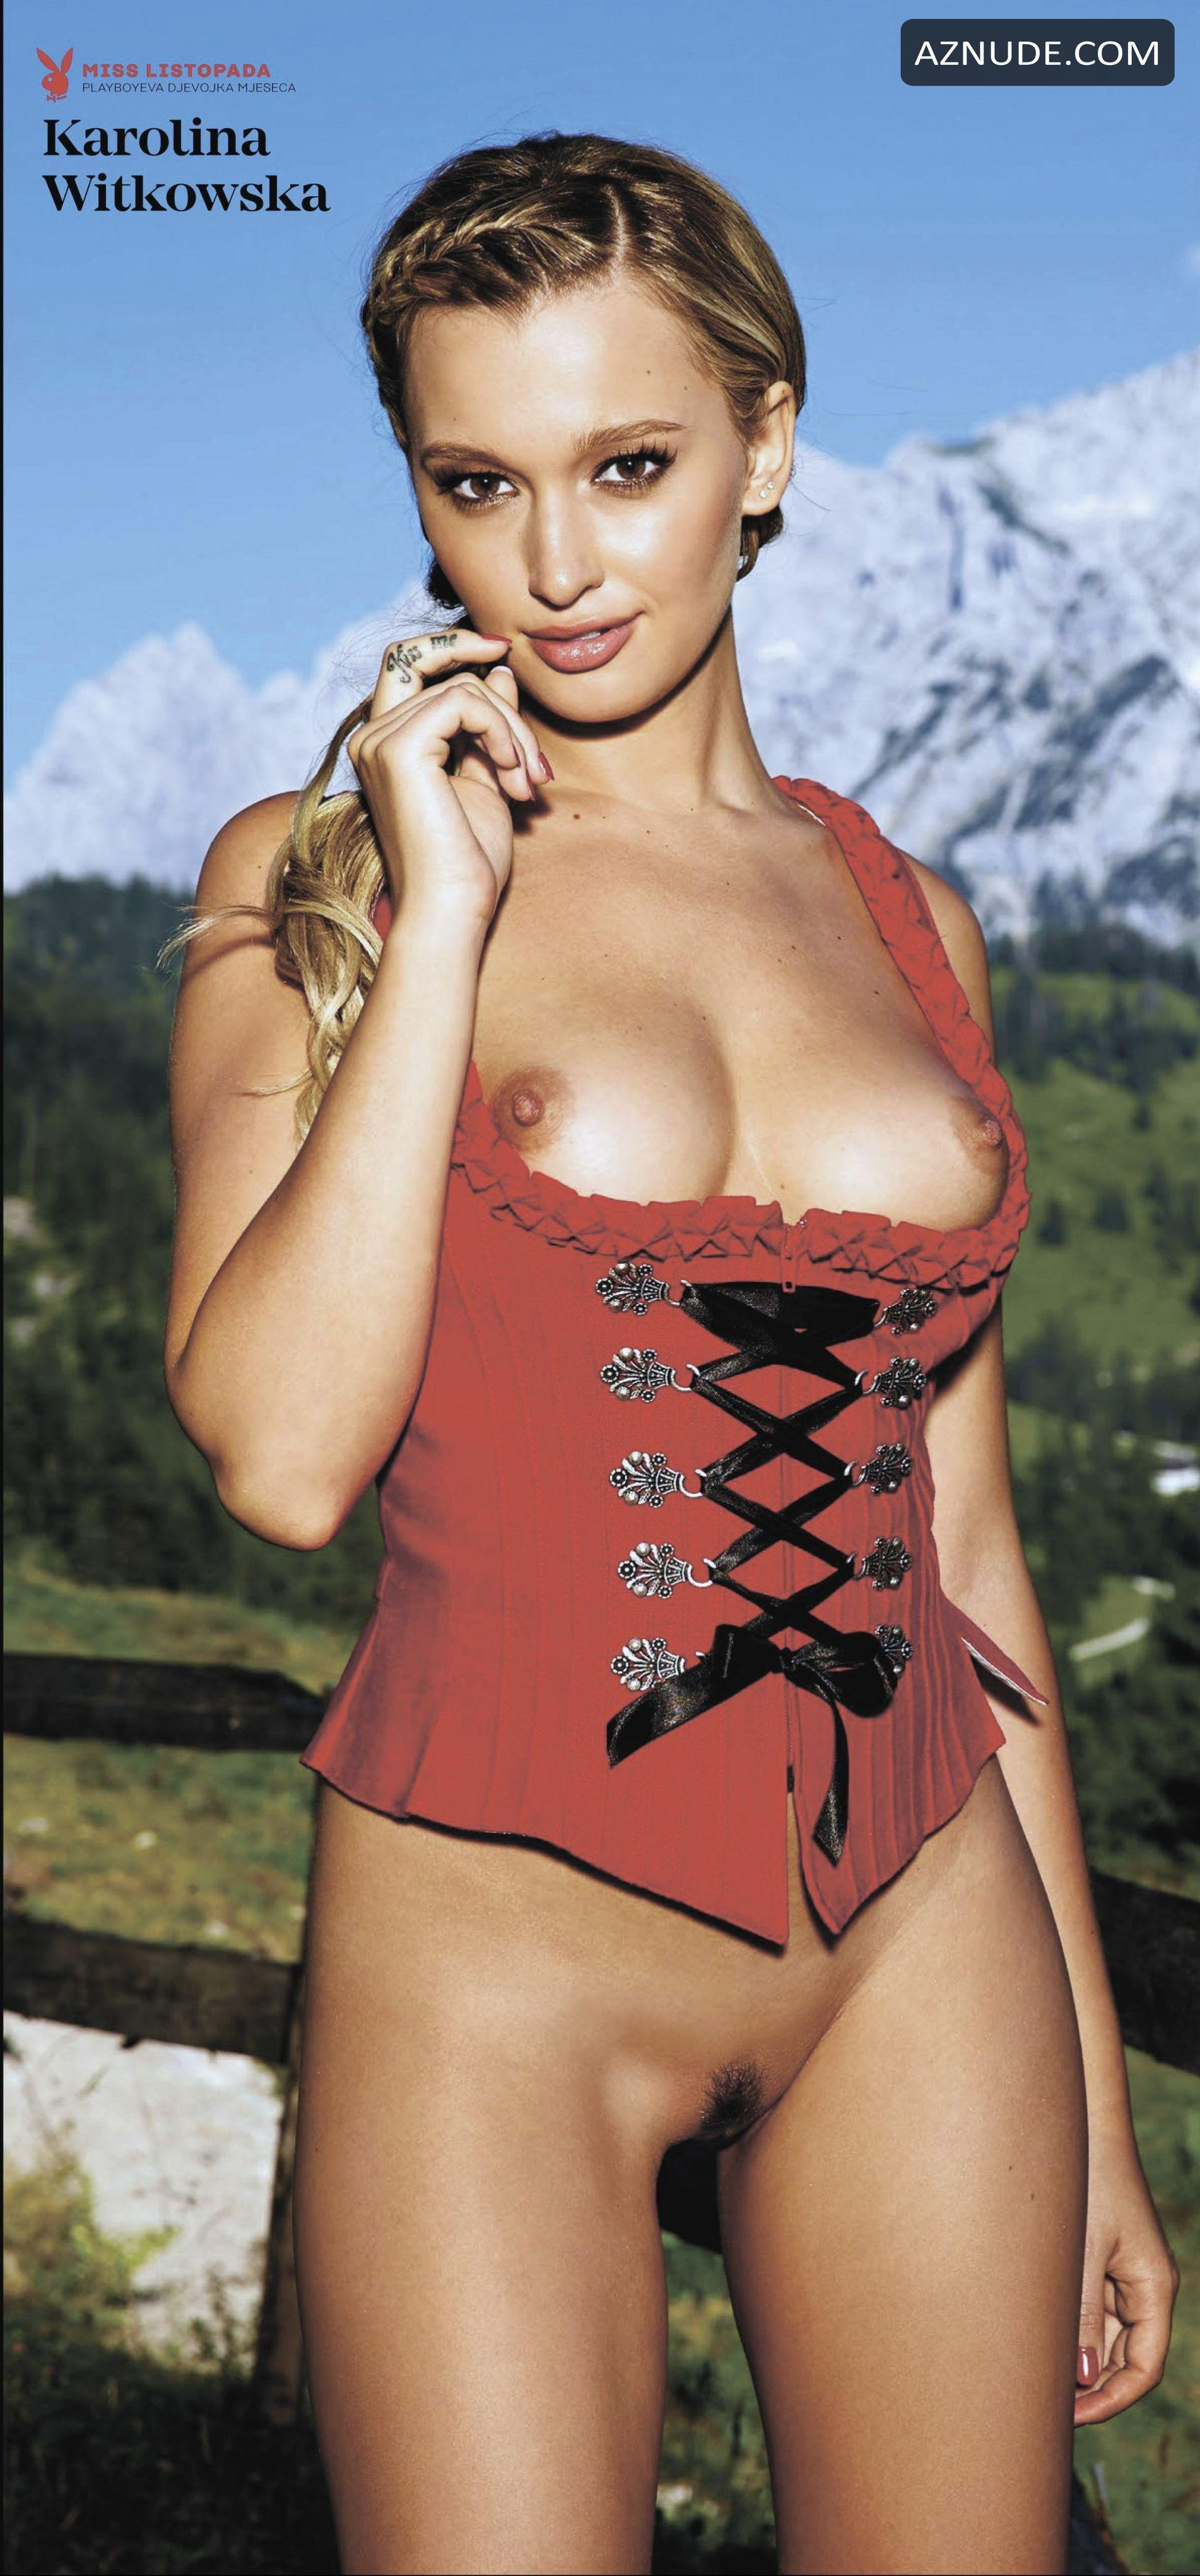 Celeb Croatia Celebs Nude Images